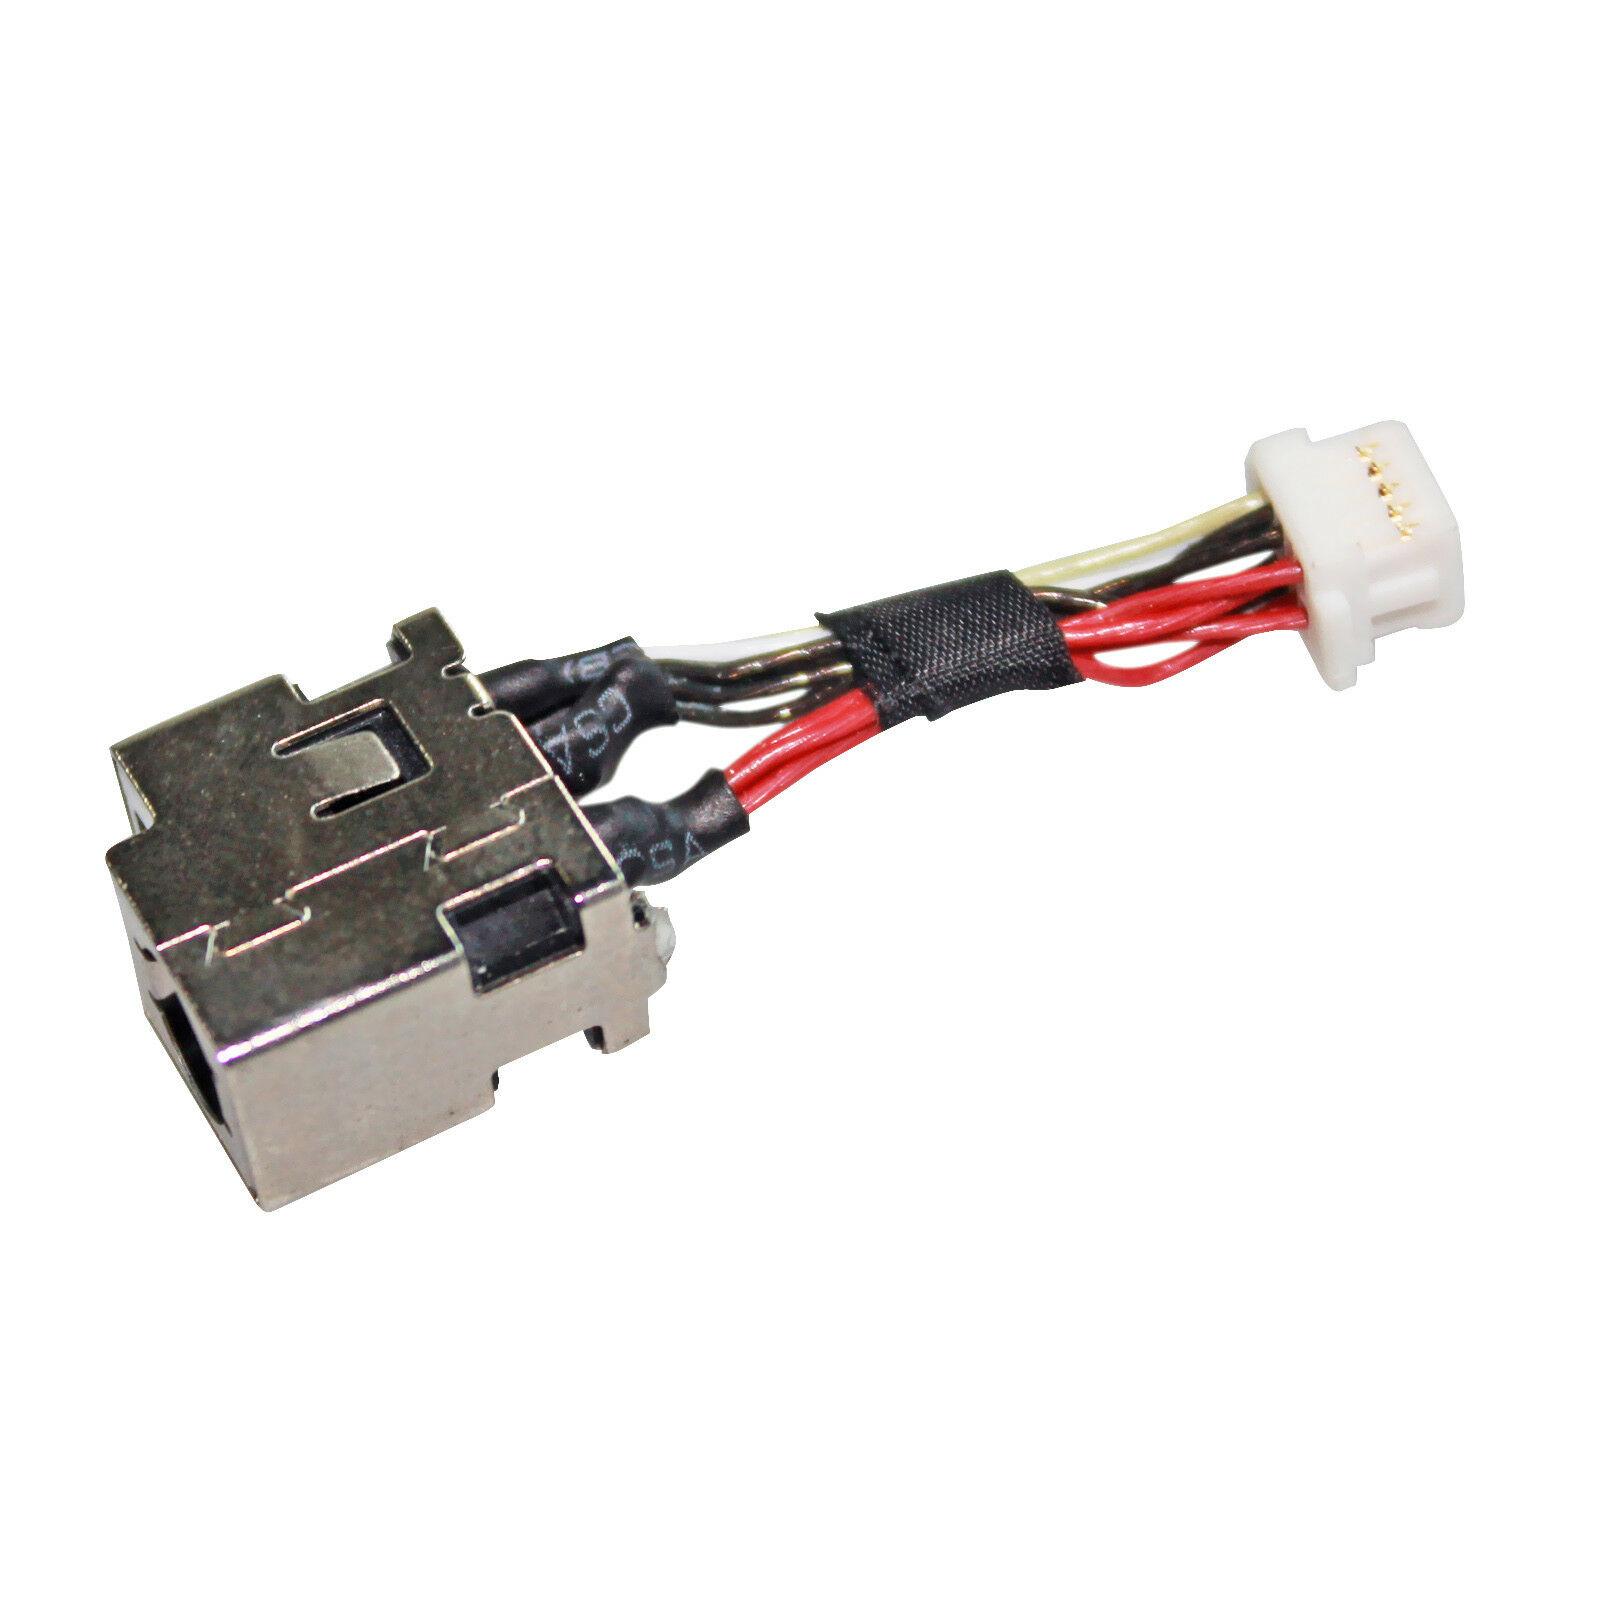 dc power jack cable wire for hp pavilion mini 311 1000nr. Black Bedroom Furniture Sets. Home Design Ideas